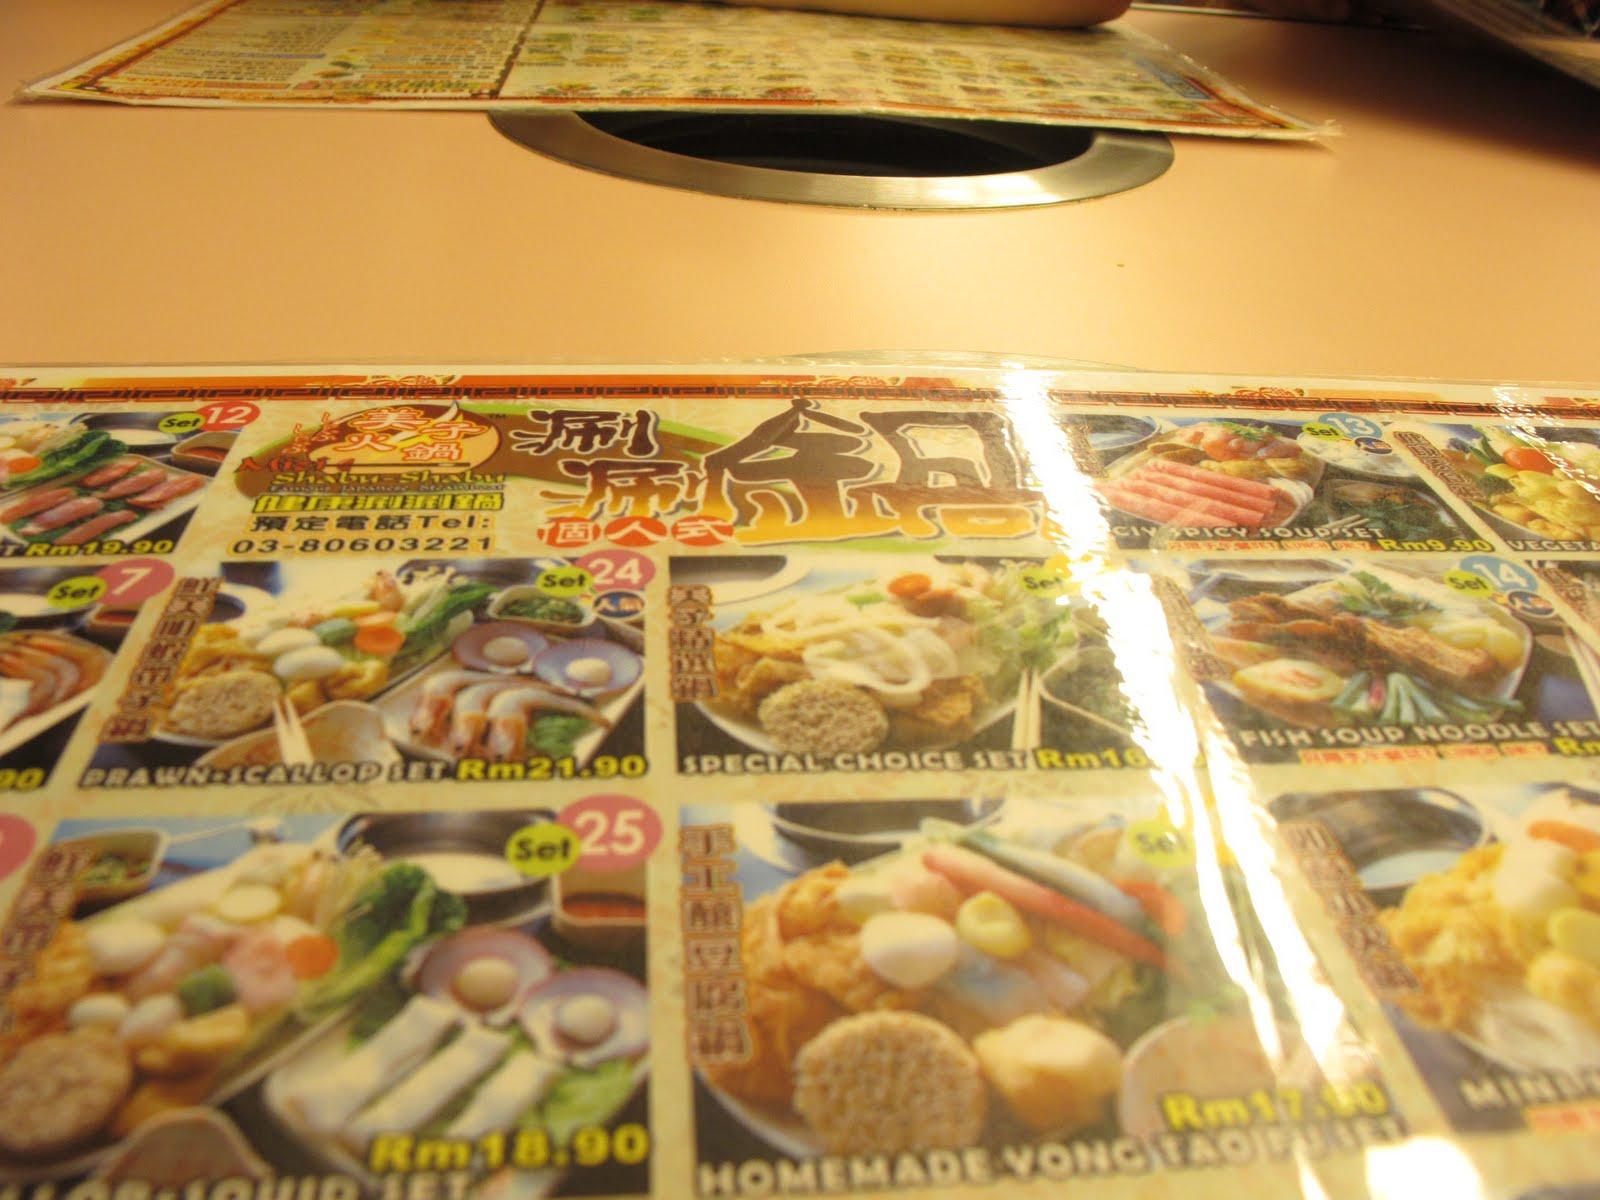 Bandar Puteri Puchong Food Court